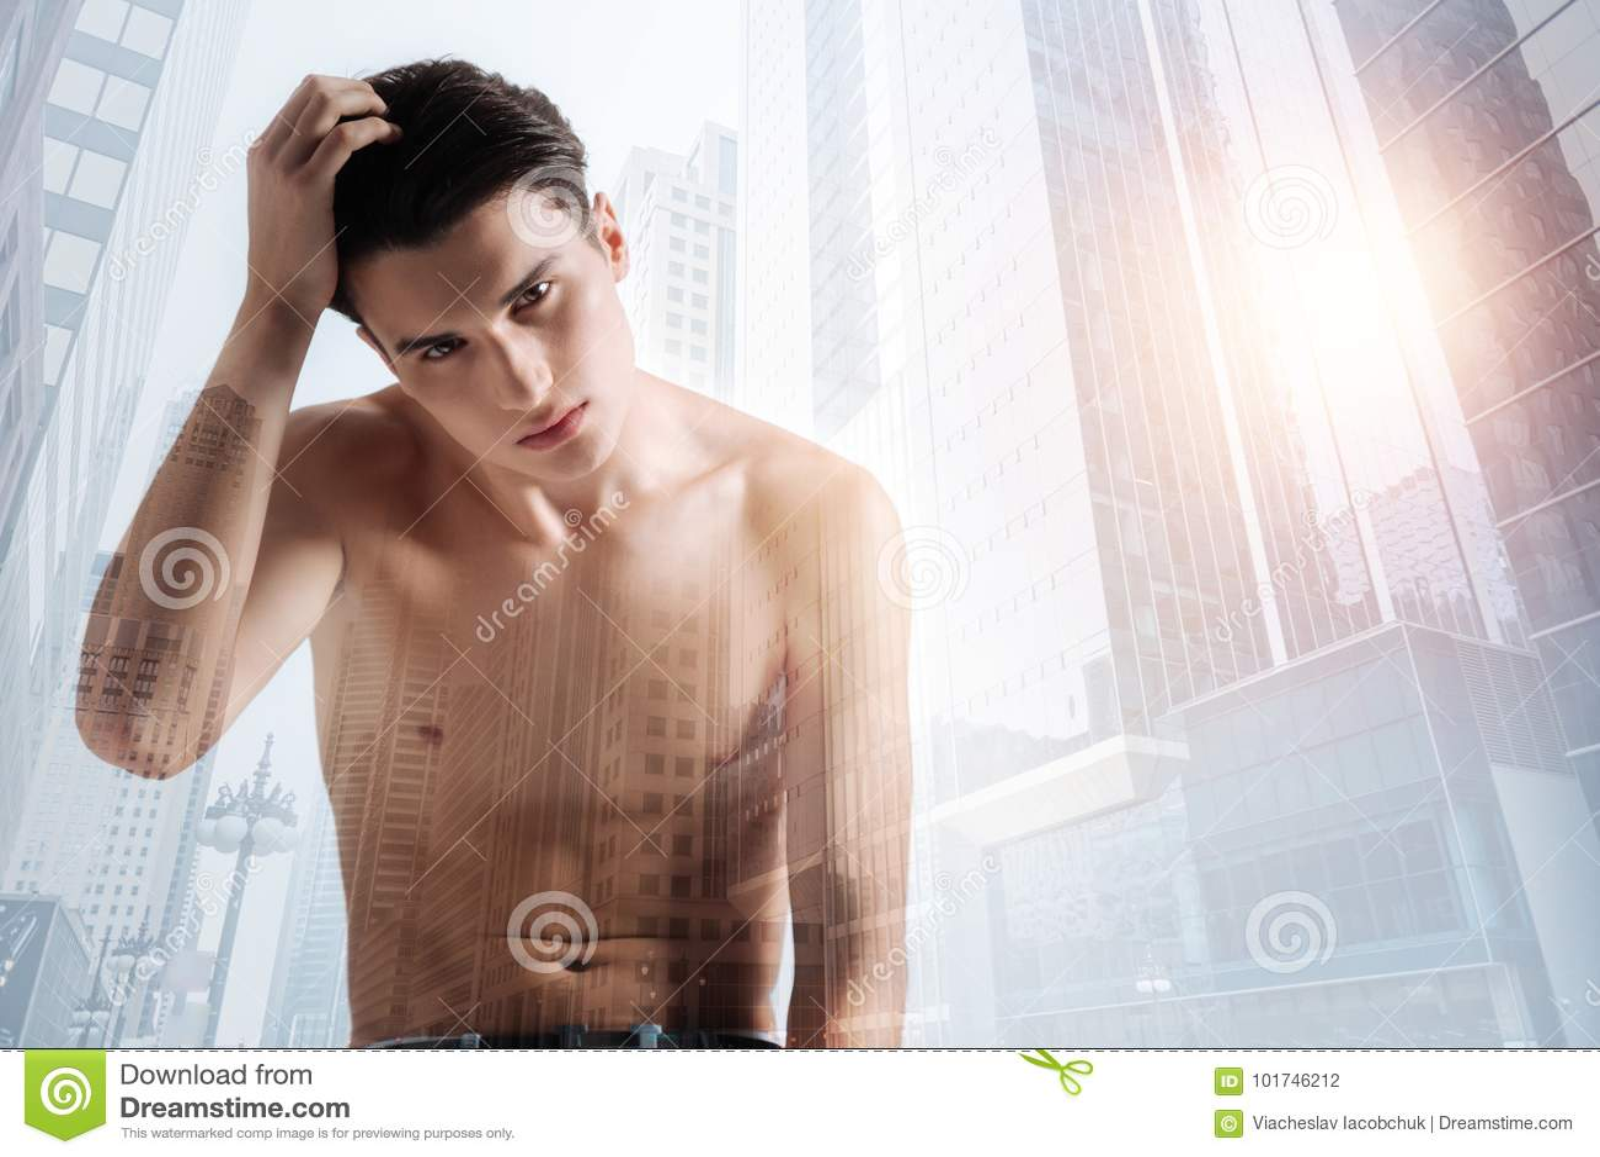 homoseksuelle mandlige stripper sex